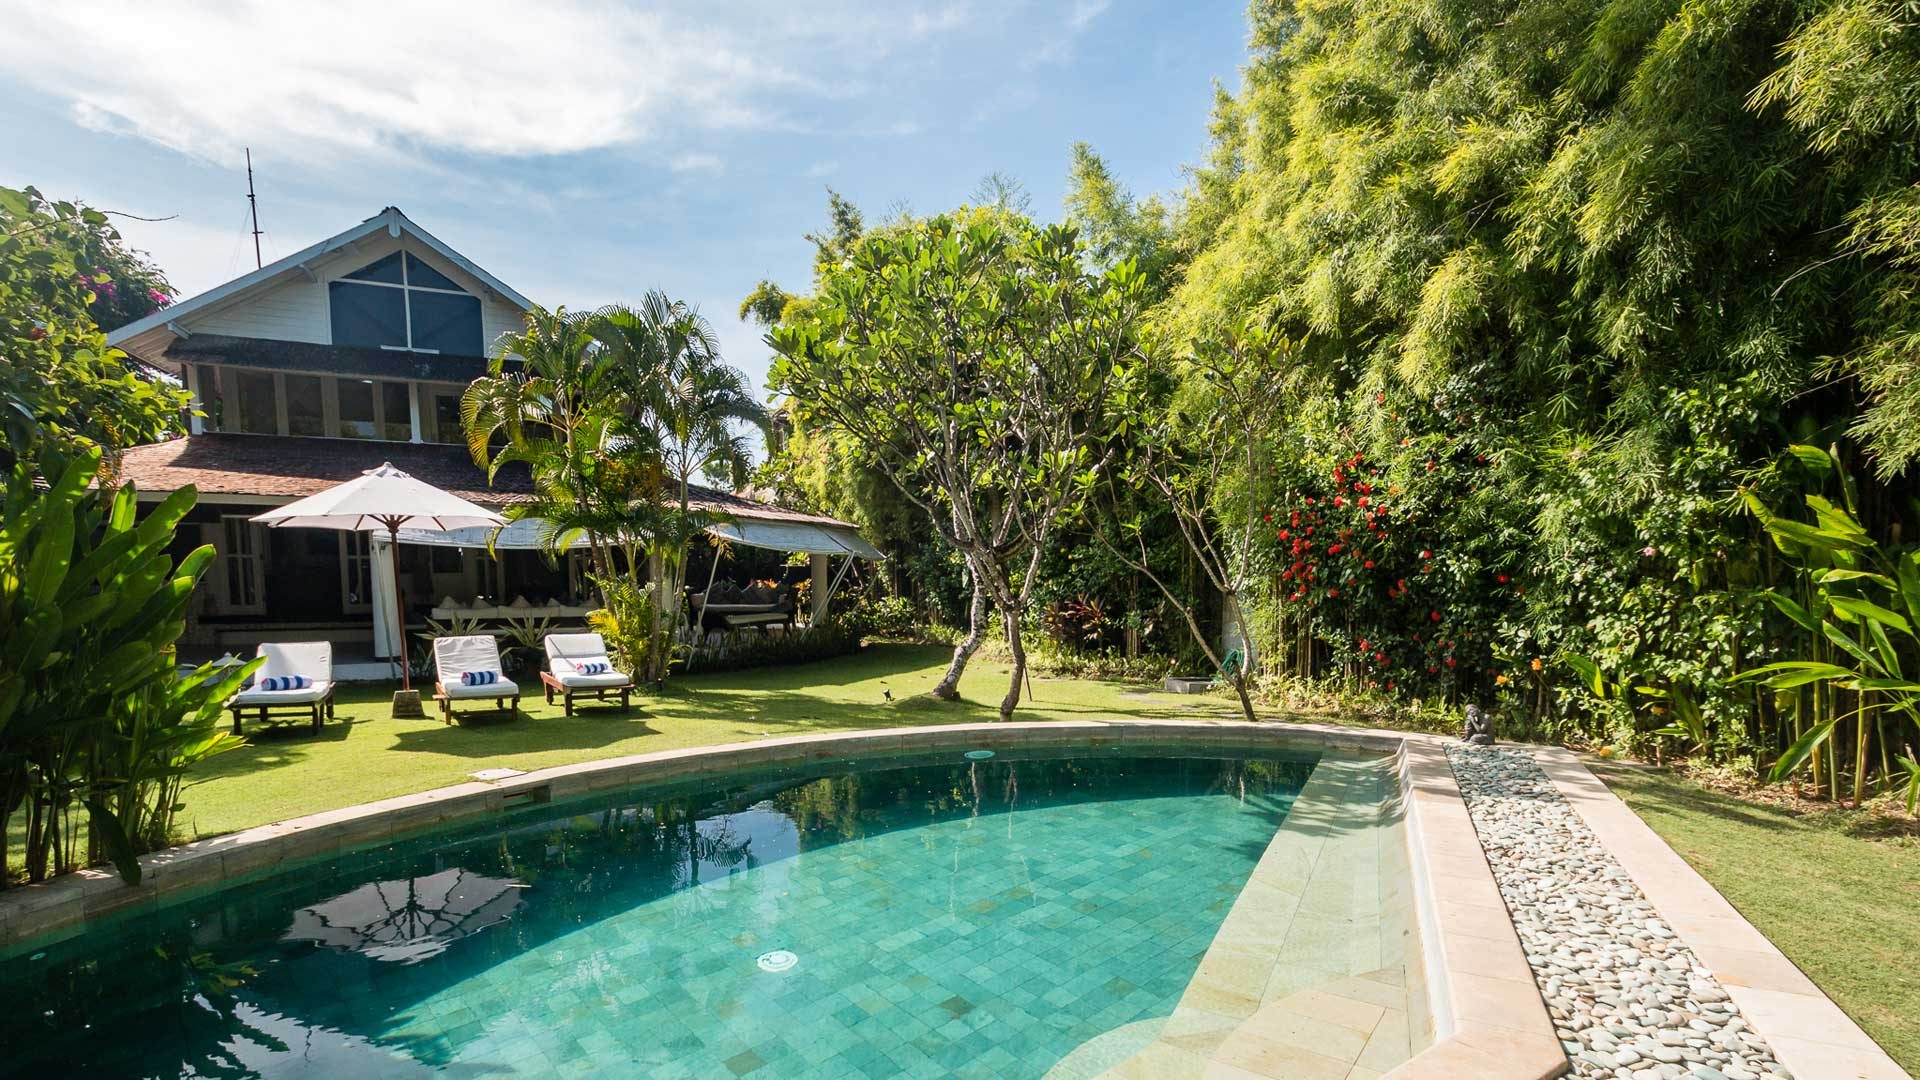 Villa Pandora Villa Louer Bali Sud Ouest Seminyak: villa a louer bali